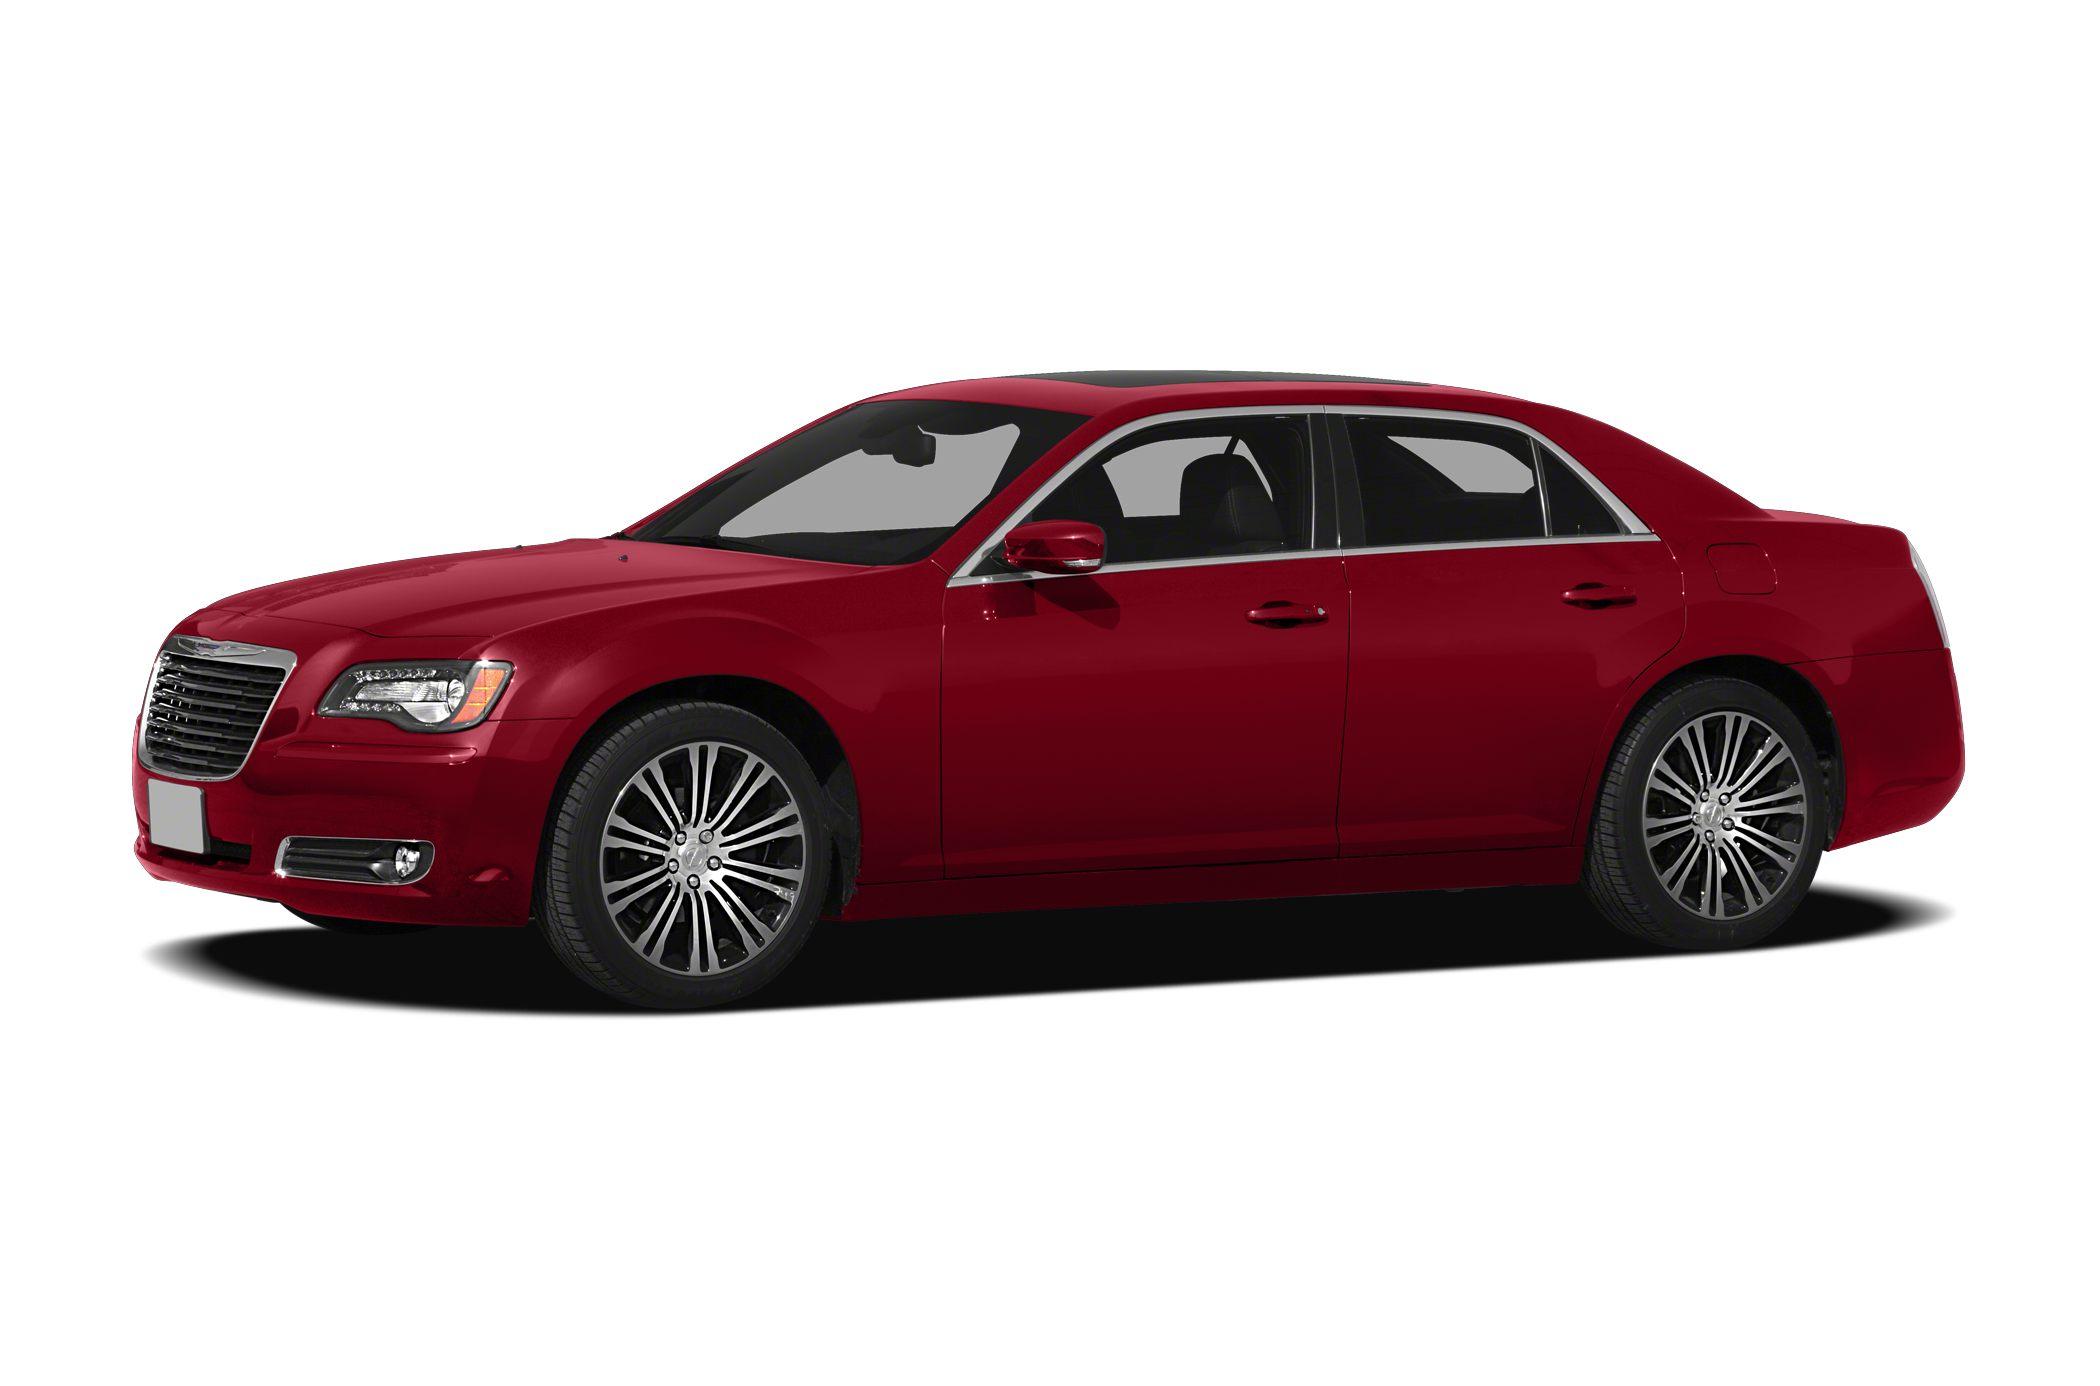 2012 Chrysler 300 S Sedan for sale in Flowood for $29,975 with 22,651 miles.